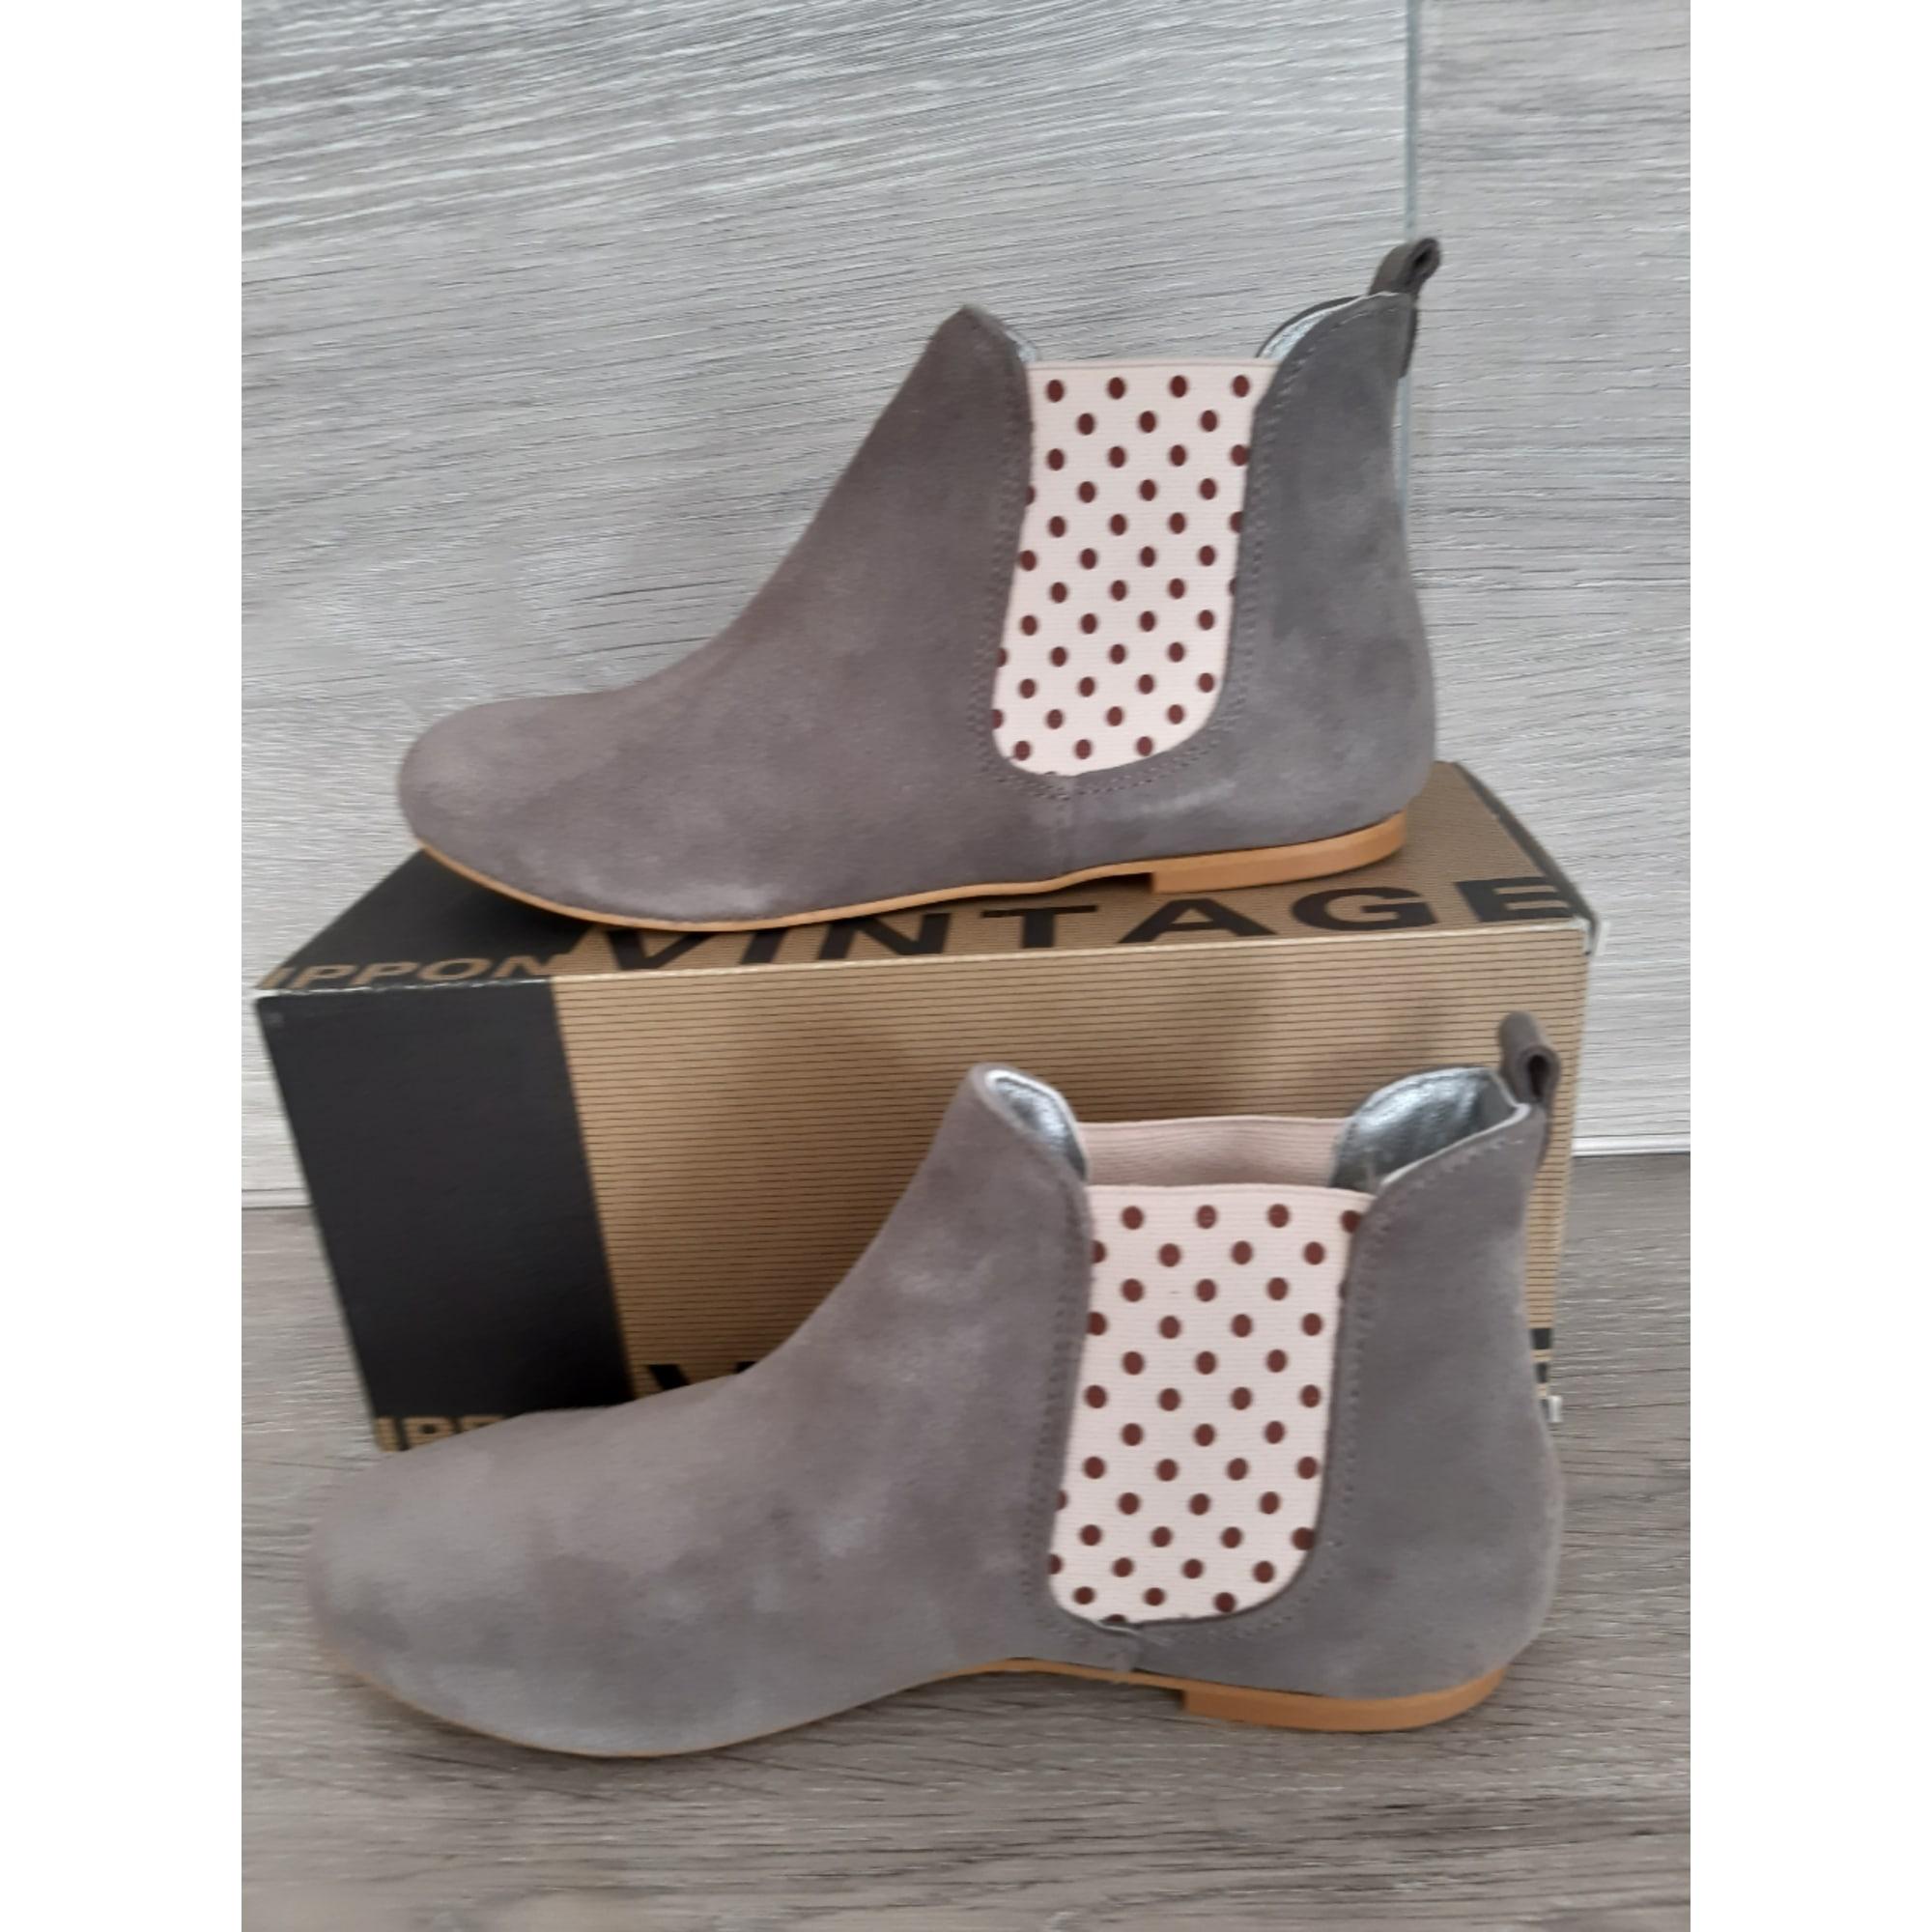 Bottines & low boots plates IPPON VINTAGE Gris, anthracite